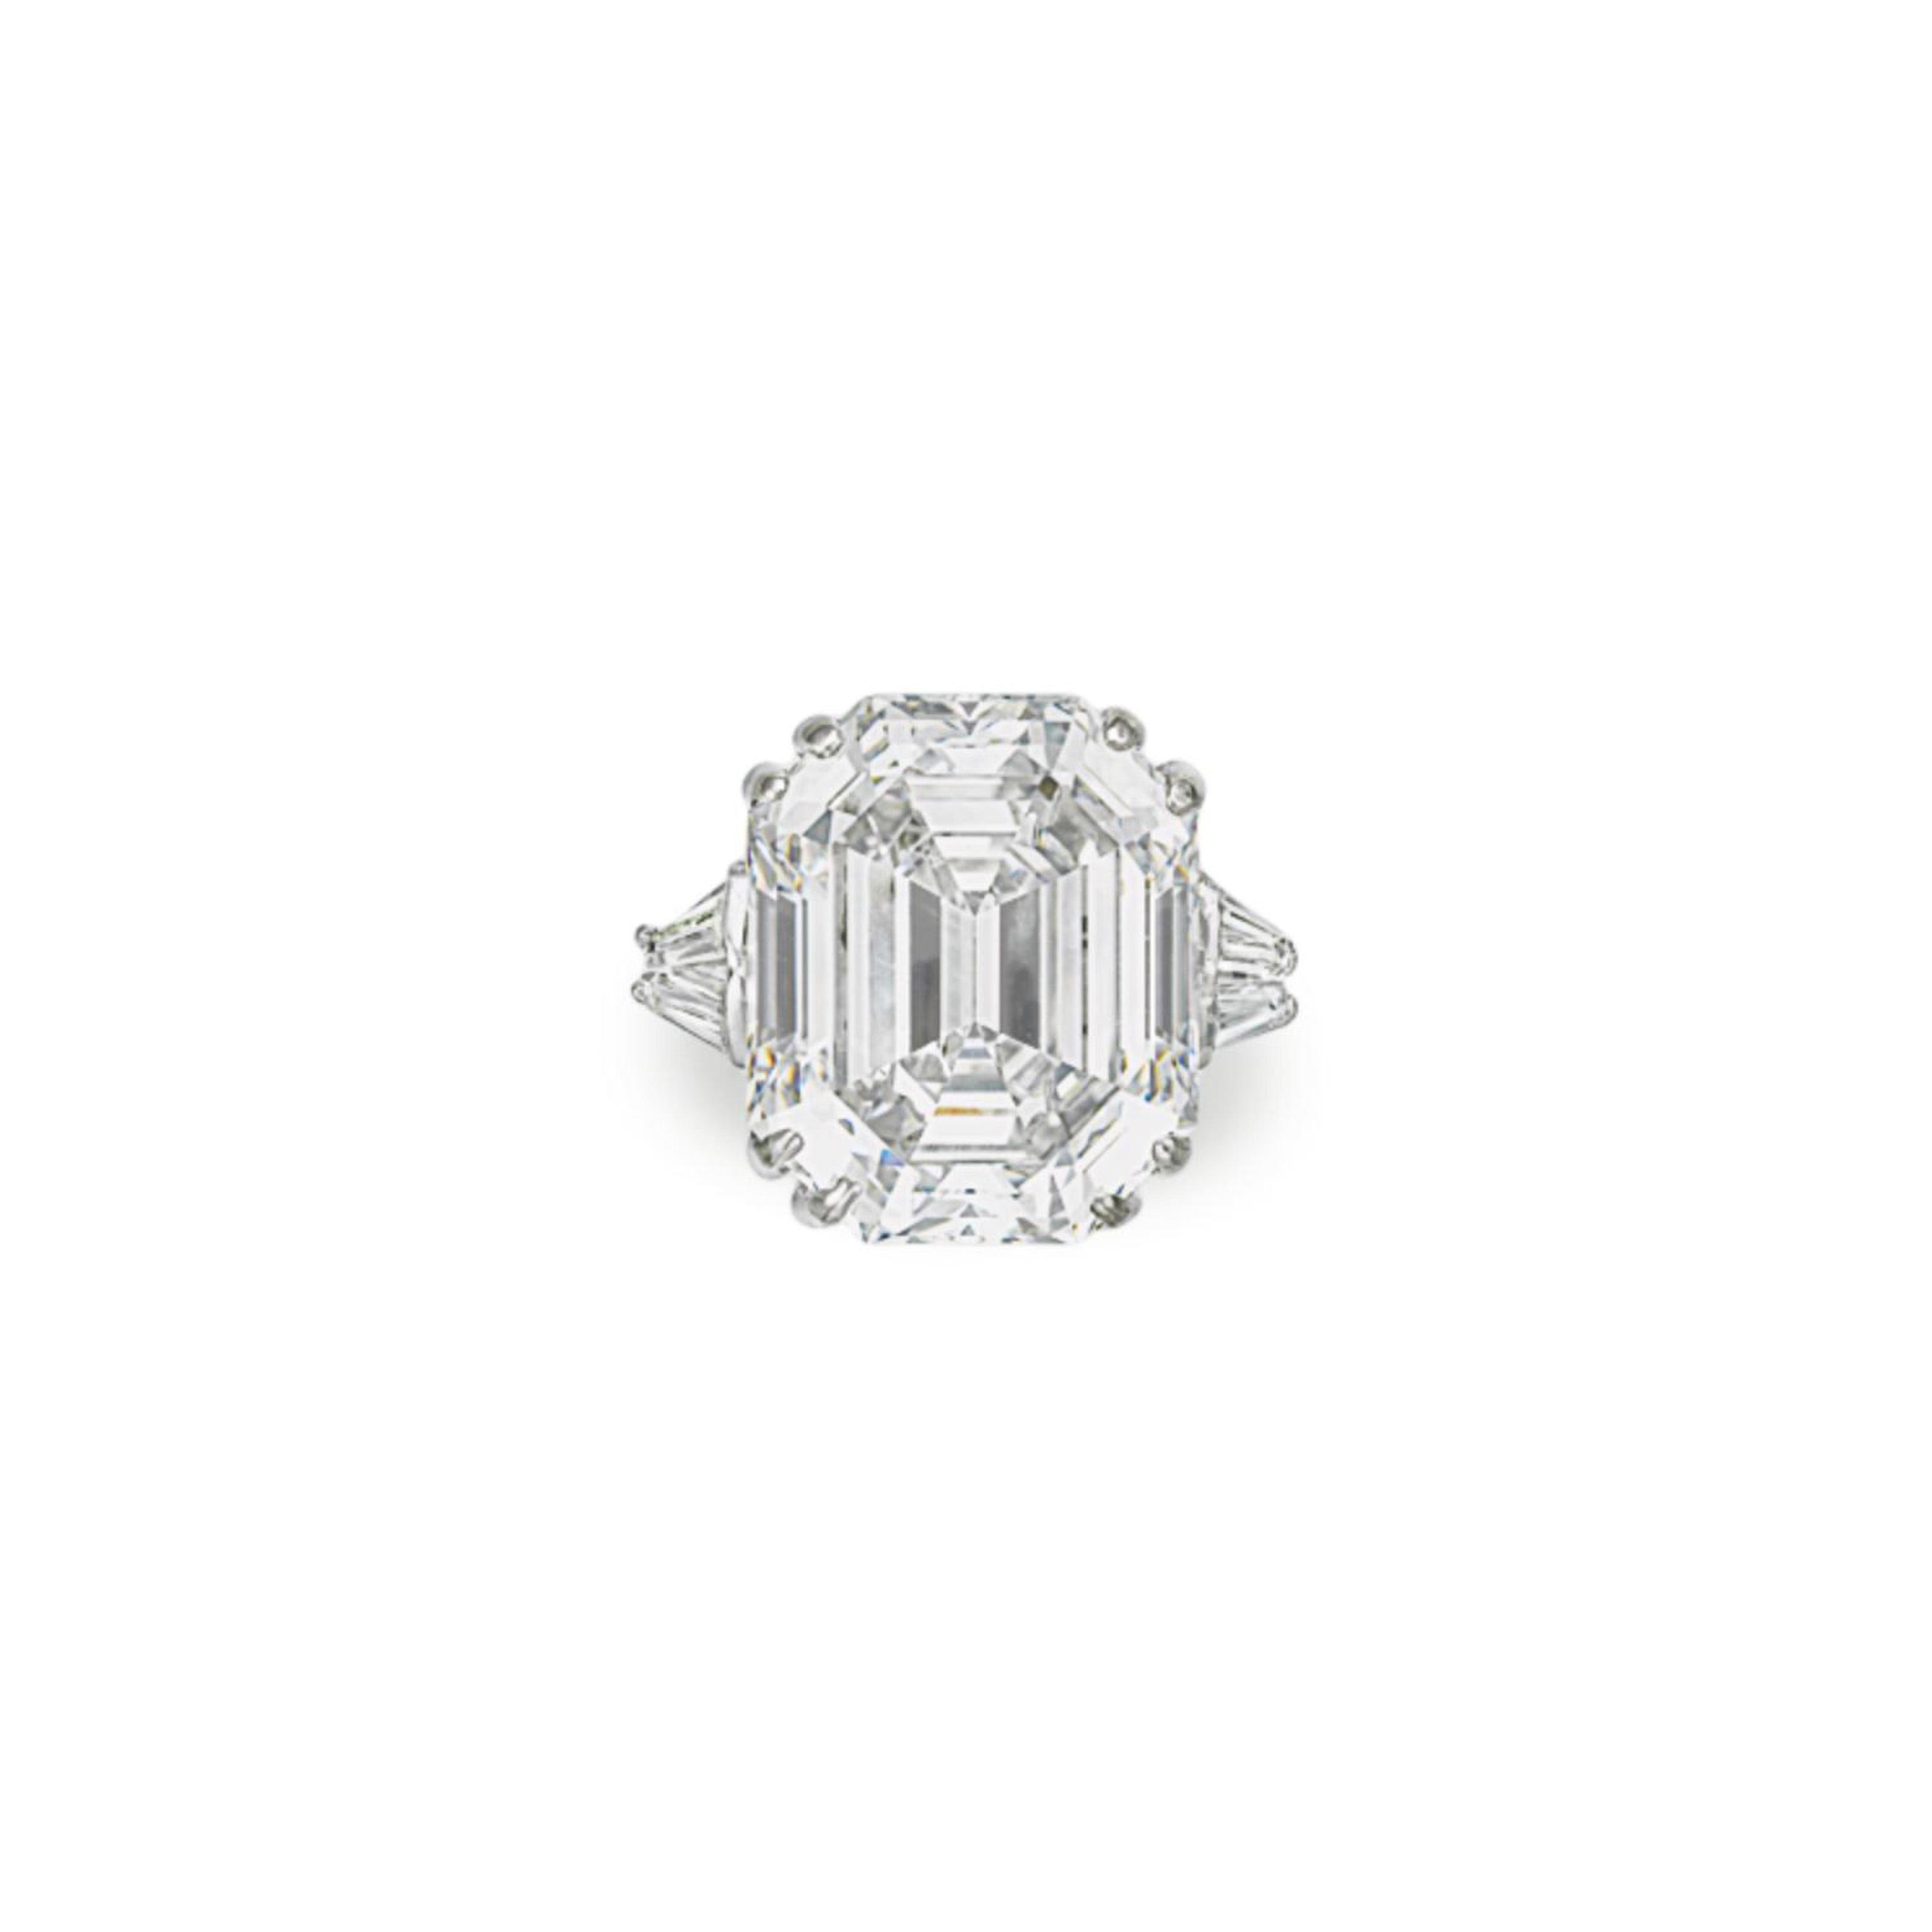 AN IMPORTANT DIAMOND RING, BY SABBADINI